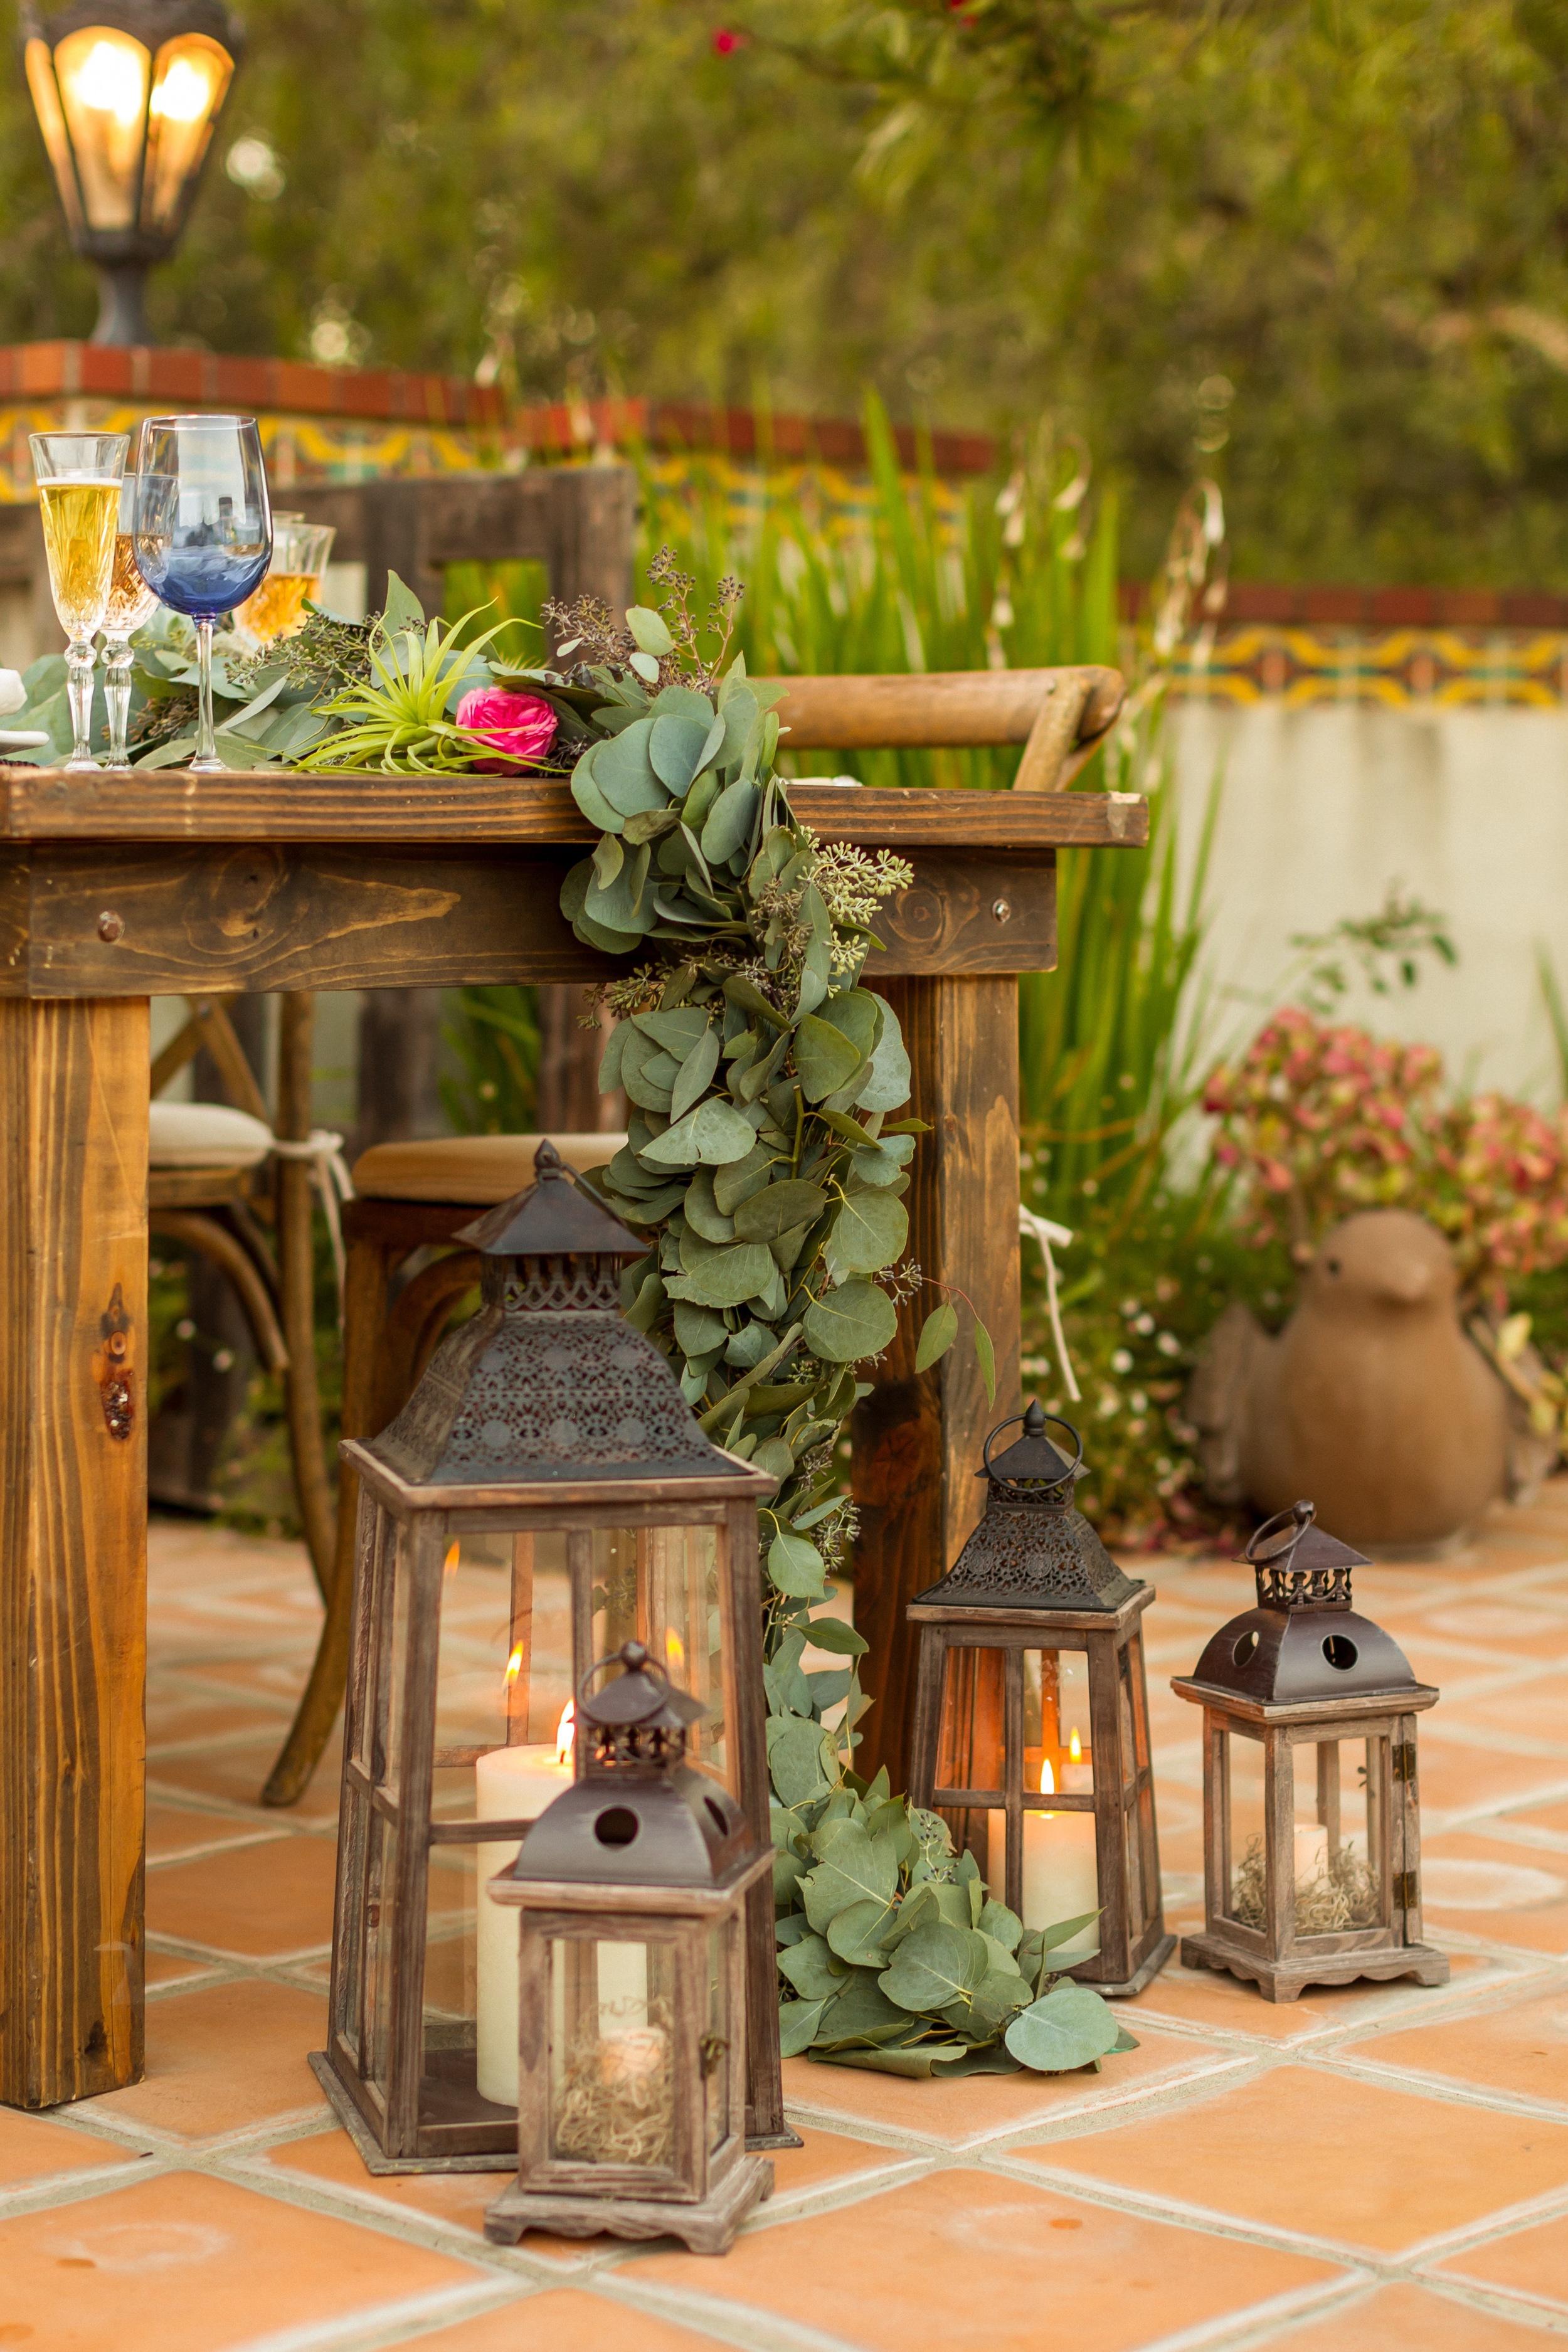 noonans-wine-country-designs-casitas-estate-2.jpg